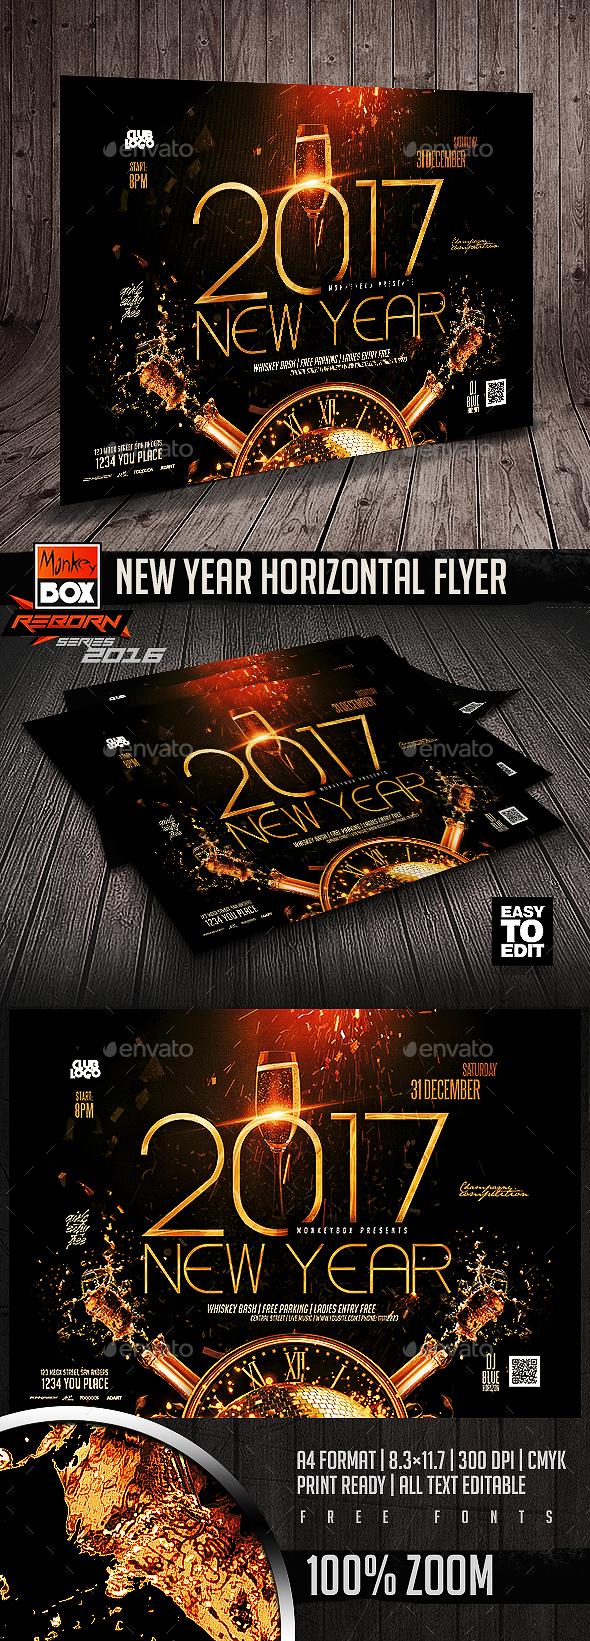 New Year Horizontal Flyer